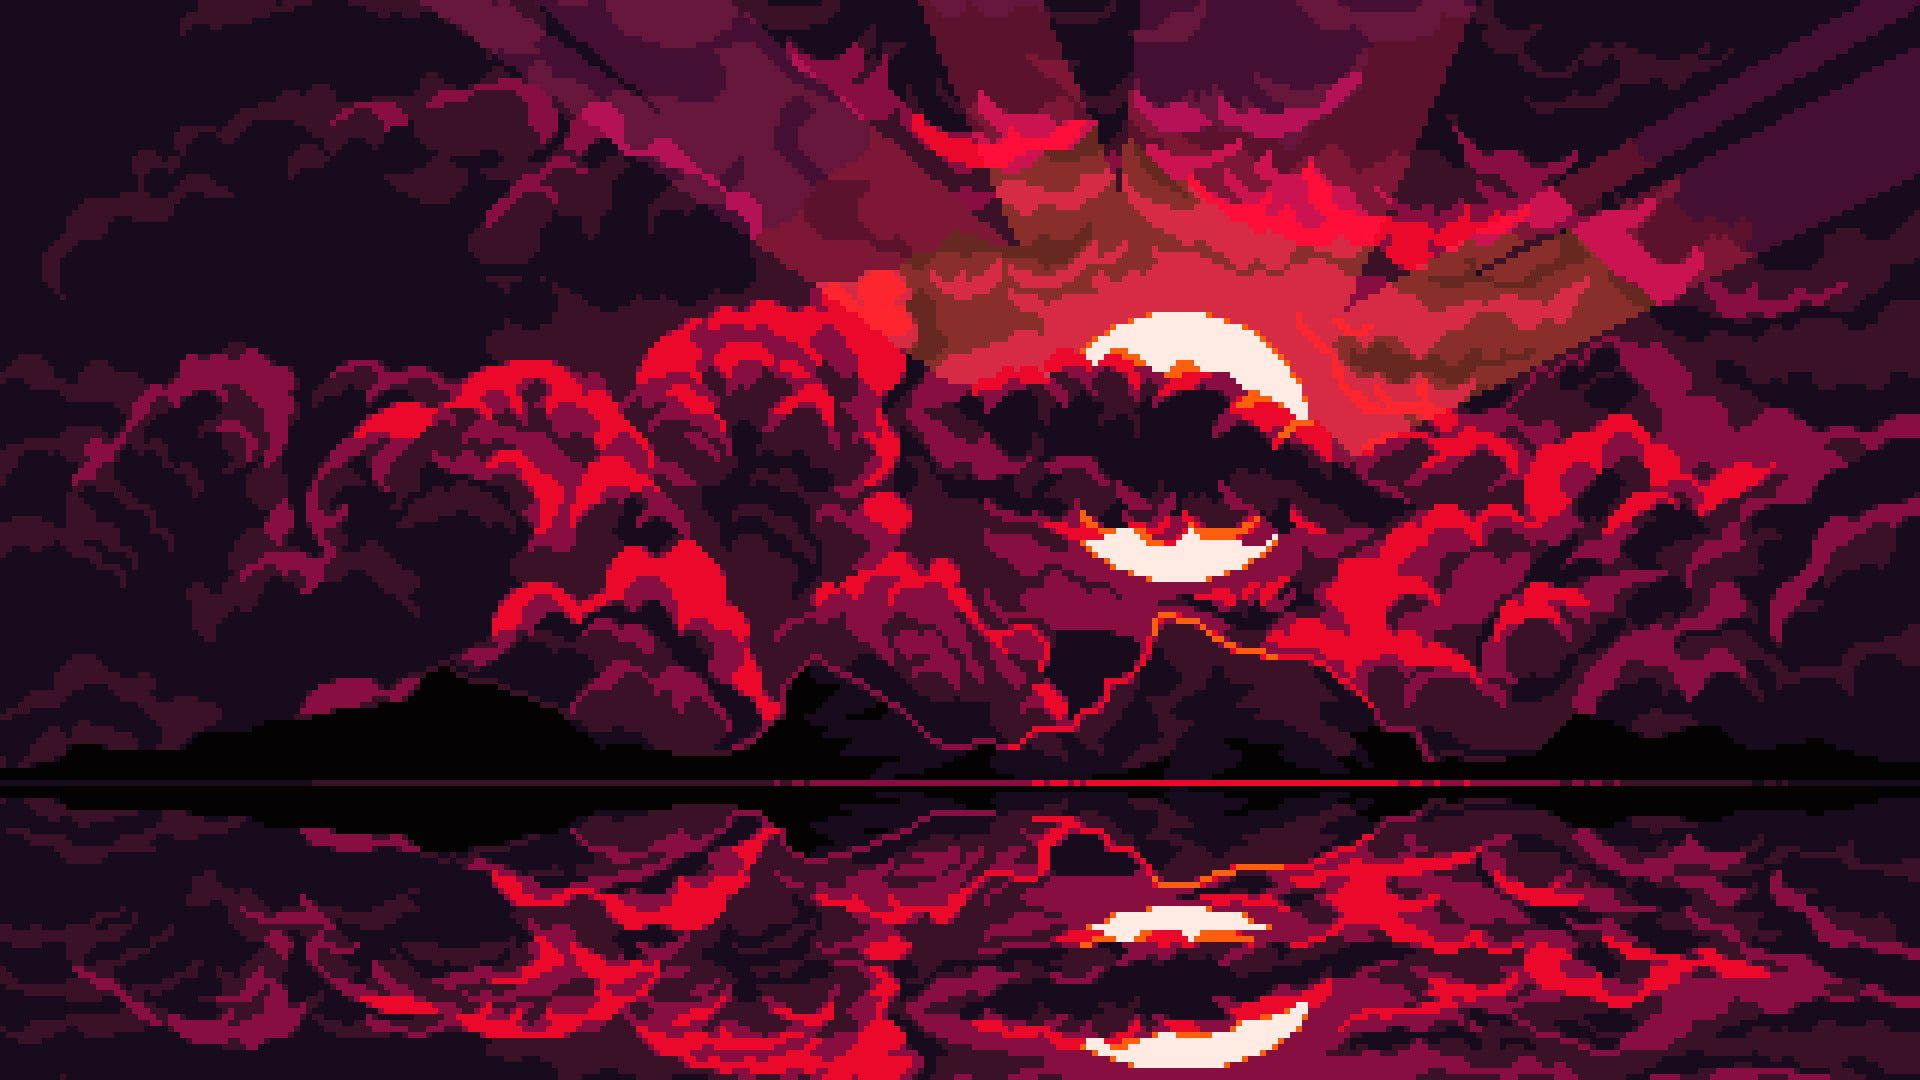 Artistic Pixel Art 1080p Wallpaper Hdwallpaper Desktop In 2020 Dark Background Wallpaper Pixel Art Vaporwave Wallpaper